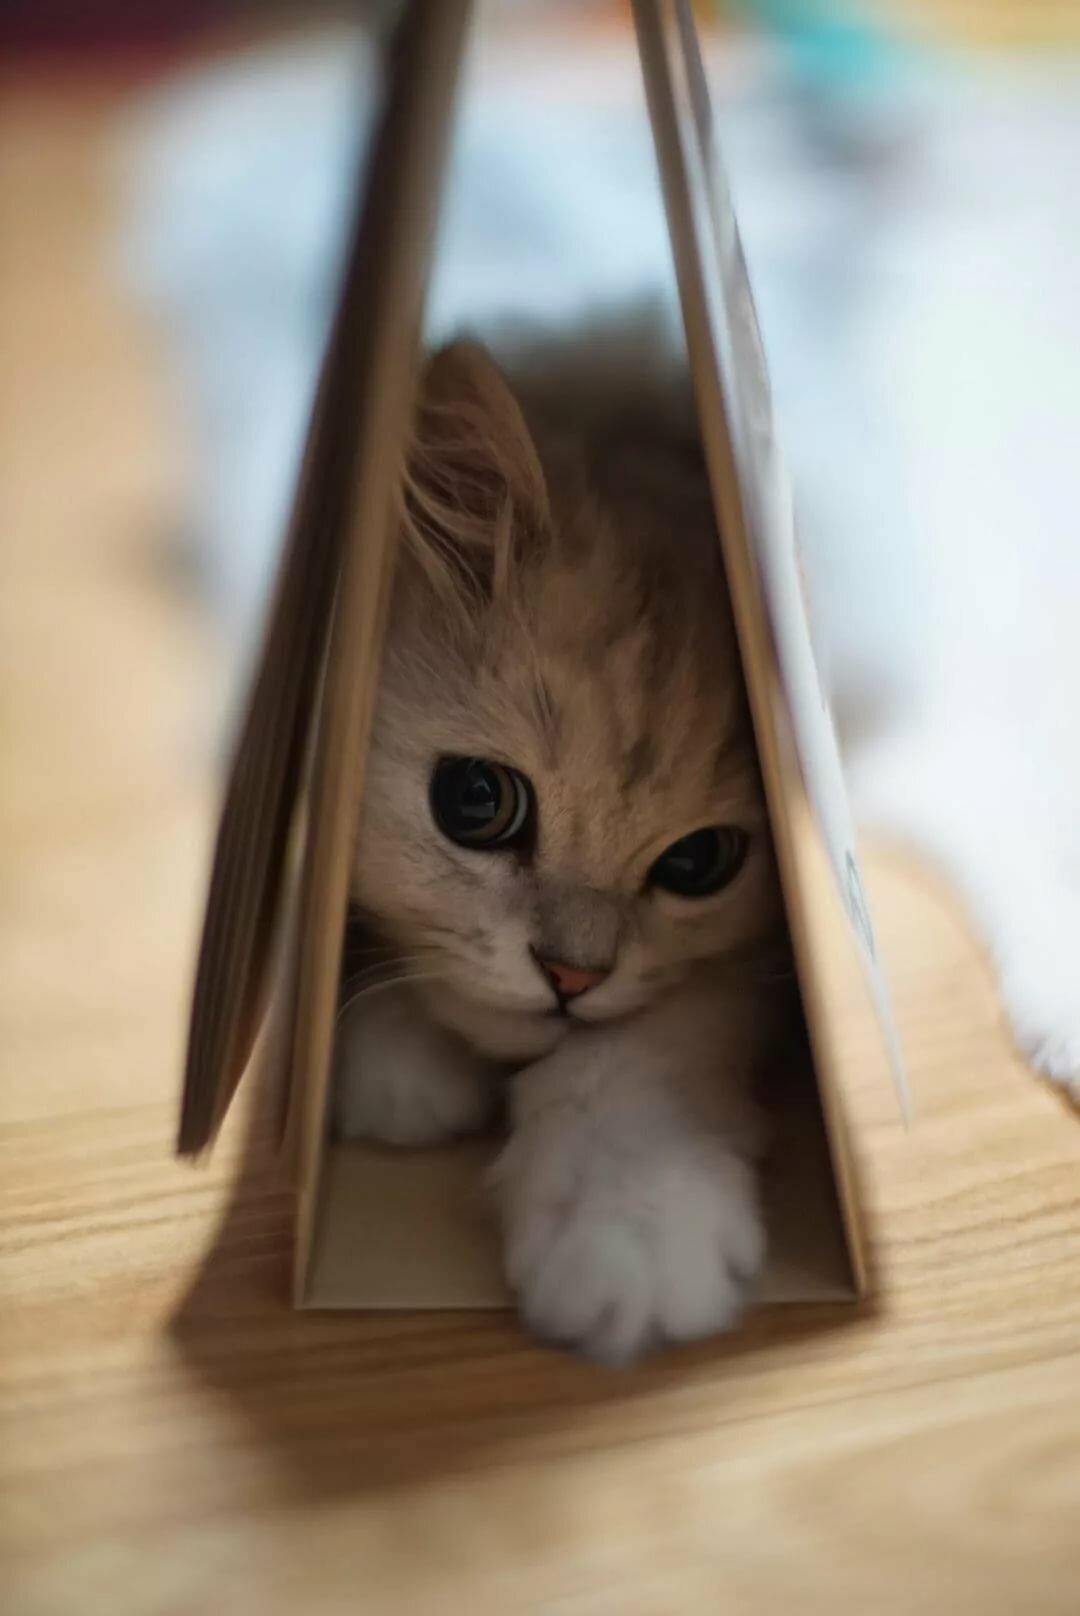 sweet little kitty by Chunsoo Son- Joe Monster.org